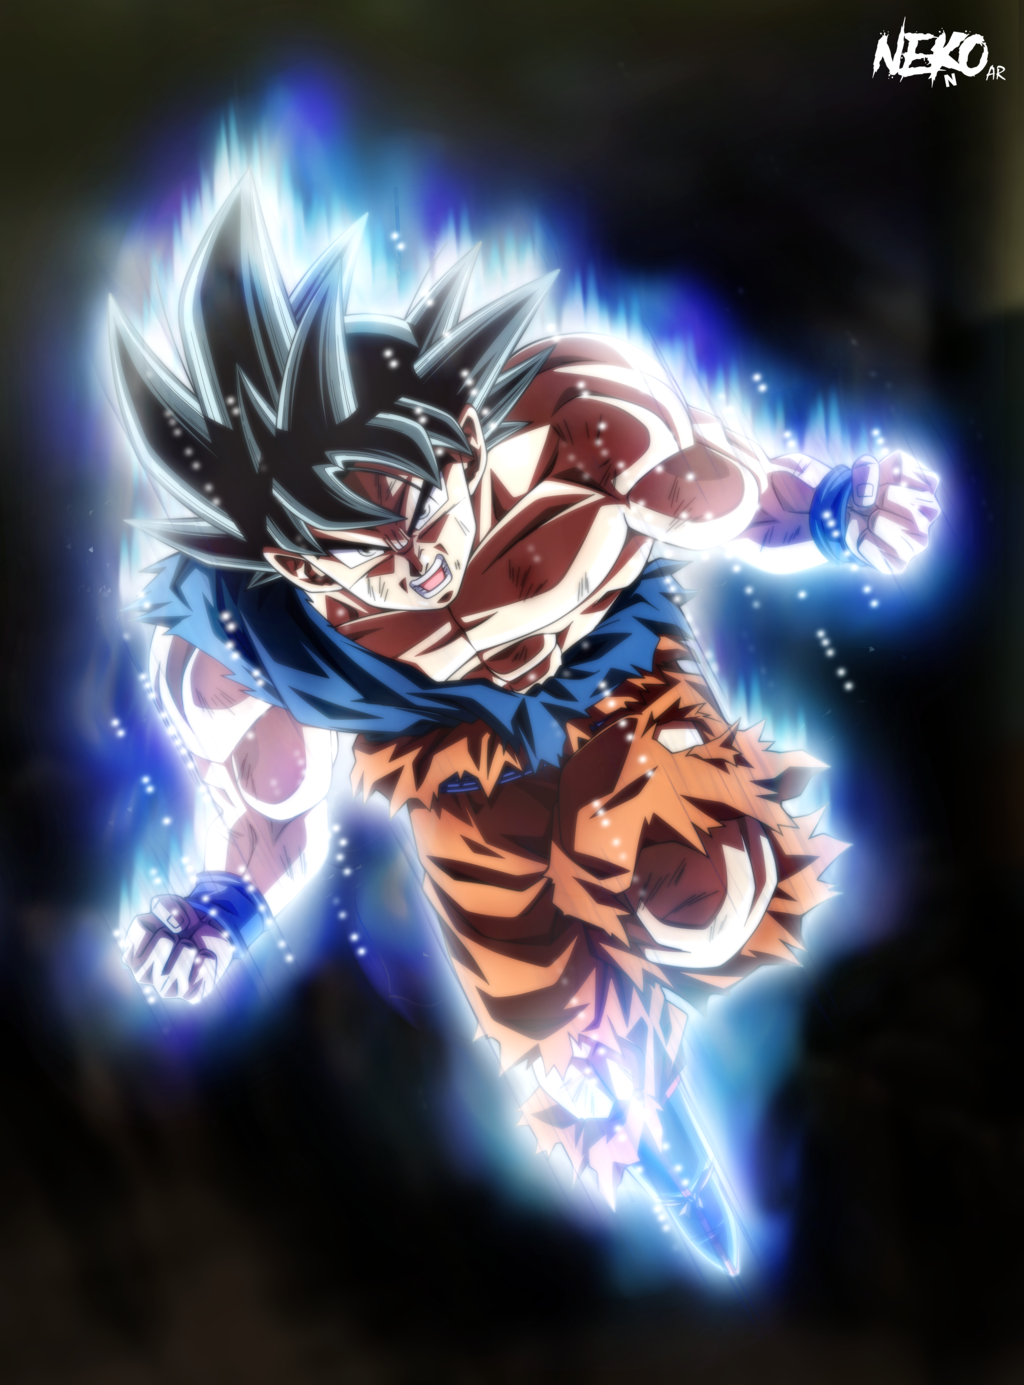 Goku Ultra Instinct Wallpapers 1024x1385